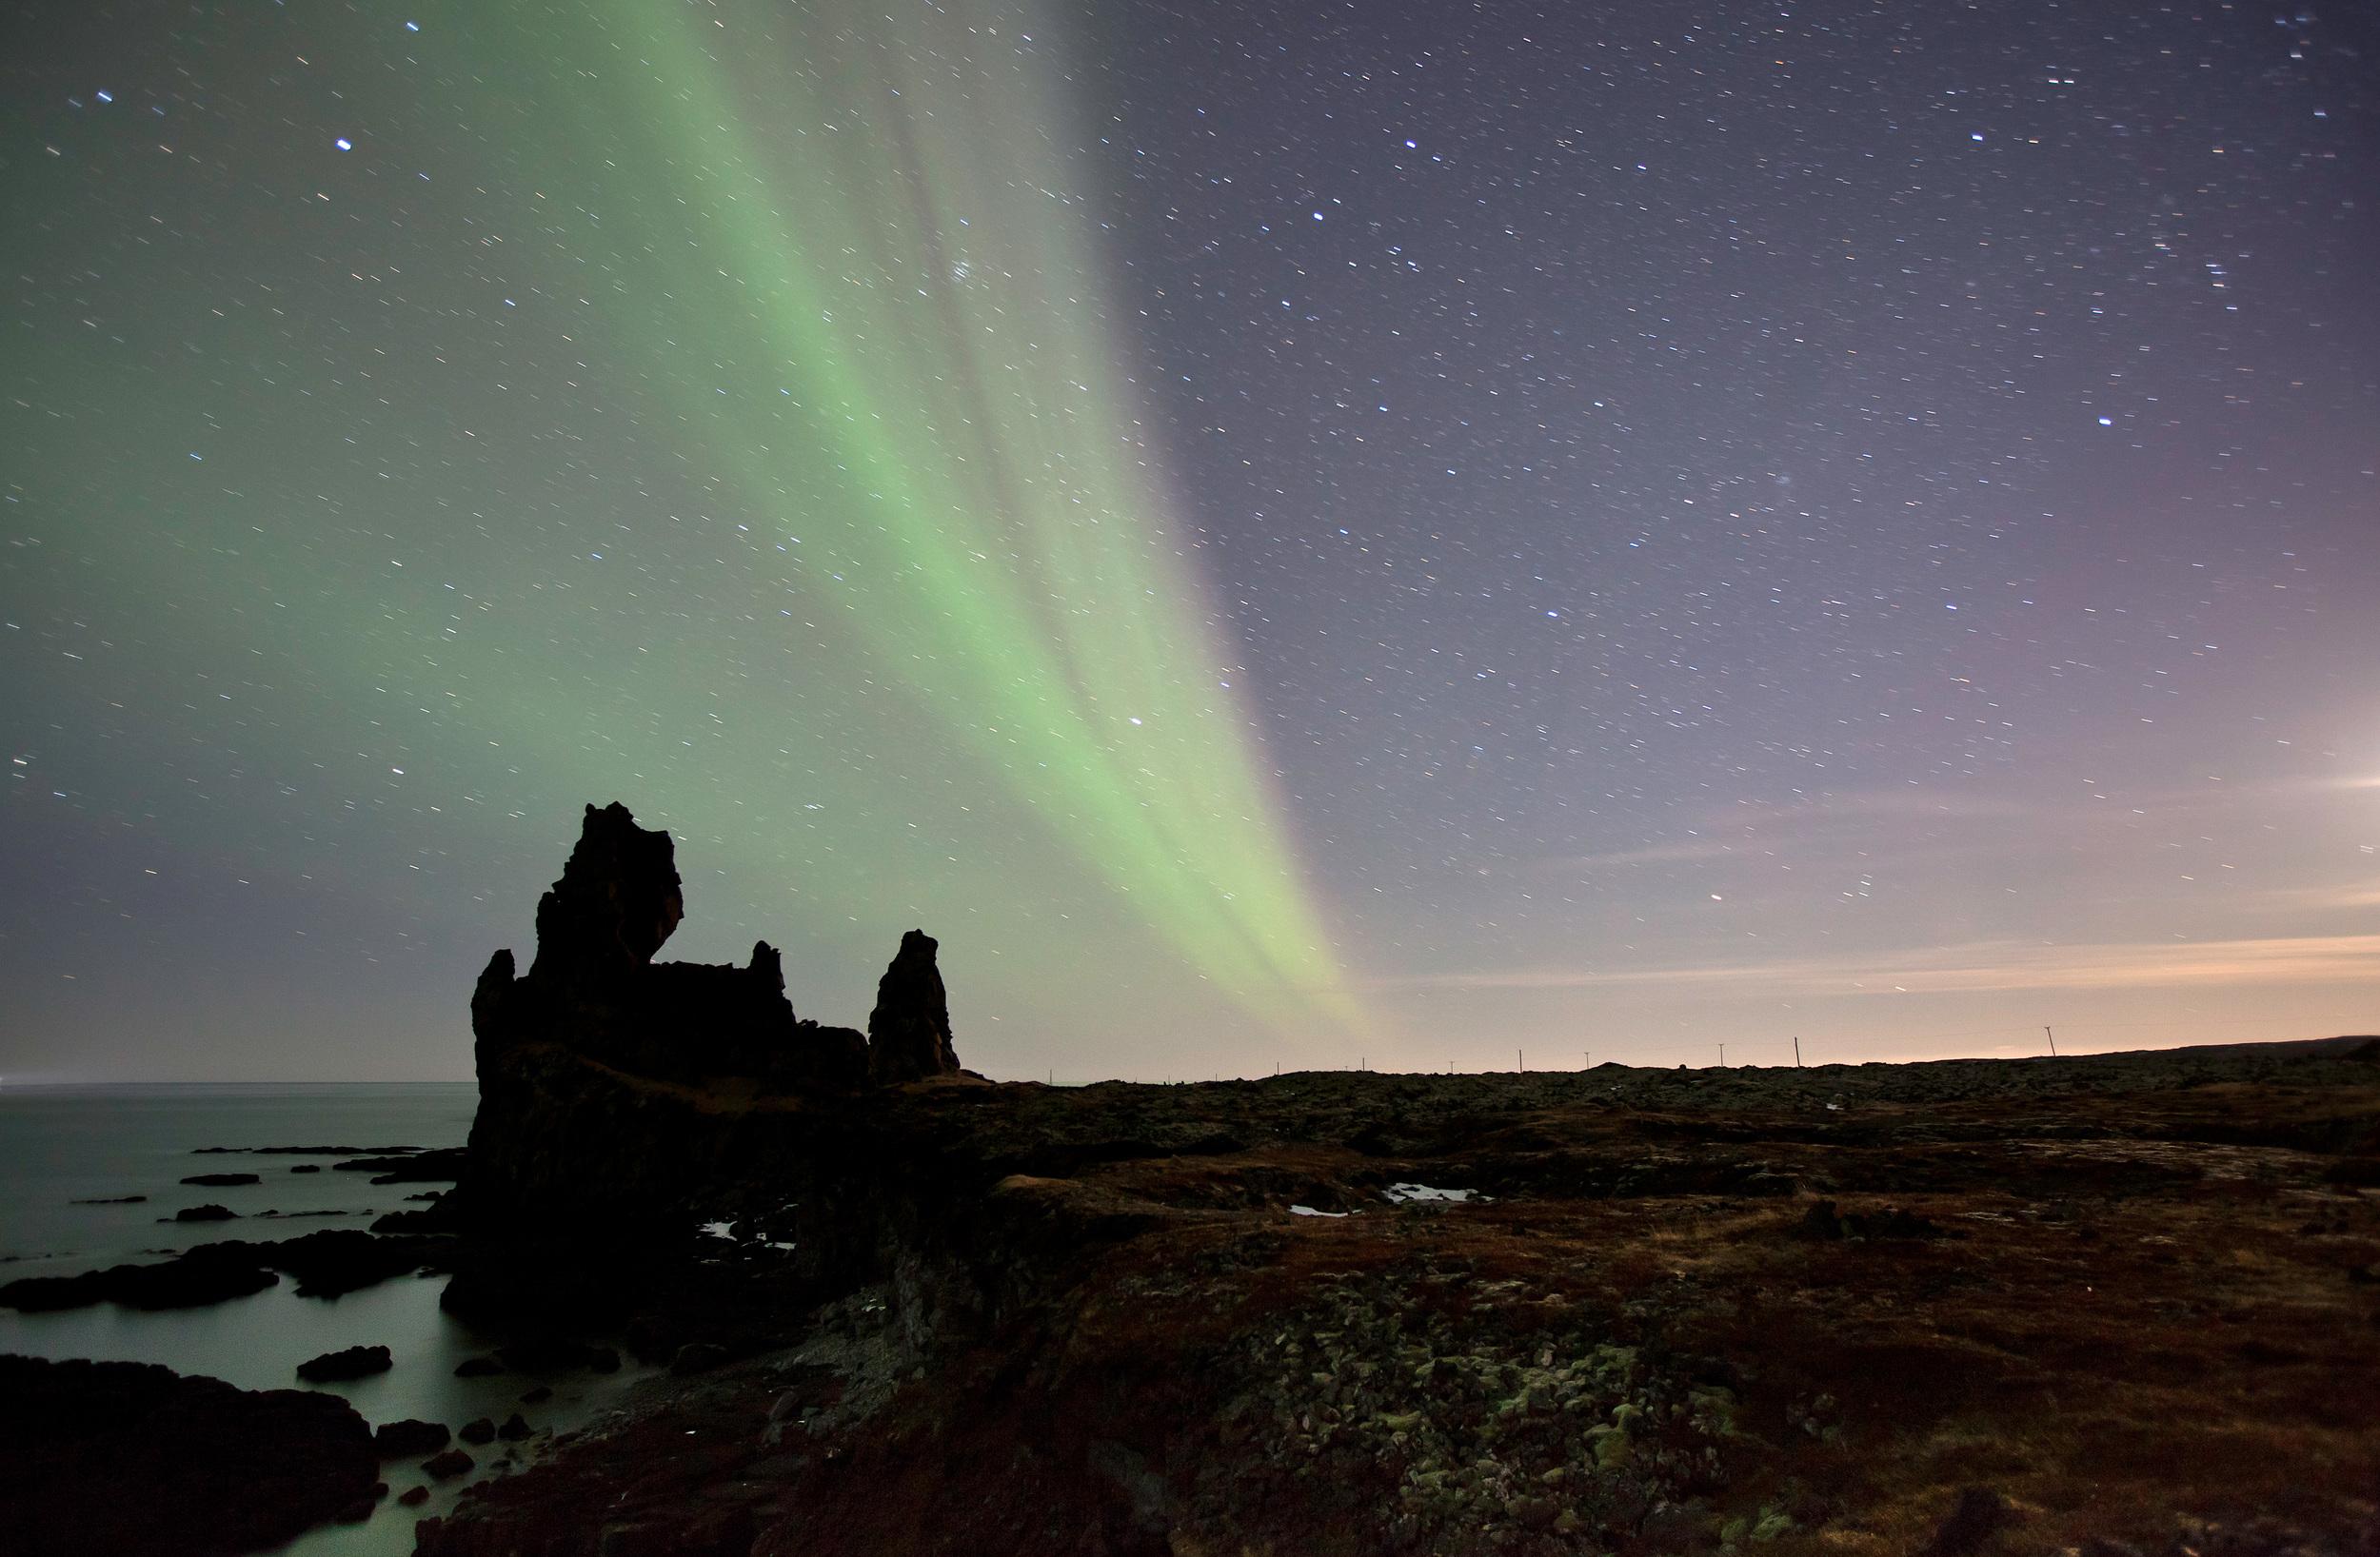 Northern lights in Snæfellsjökull national park, west iceland